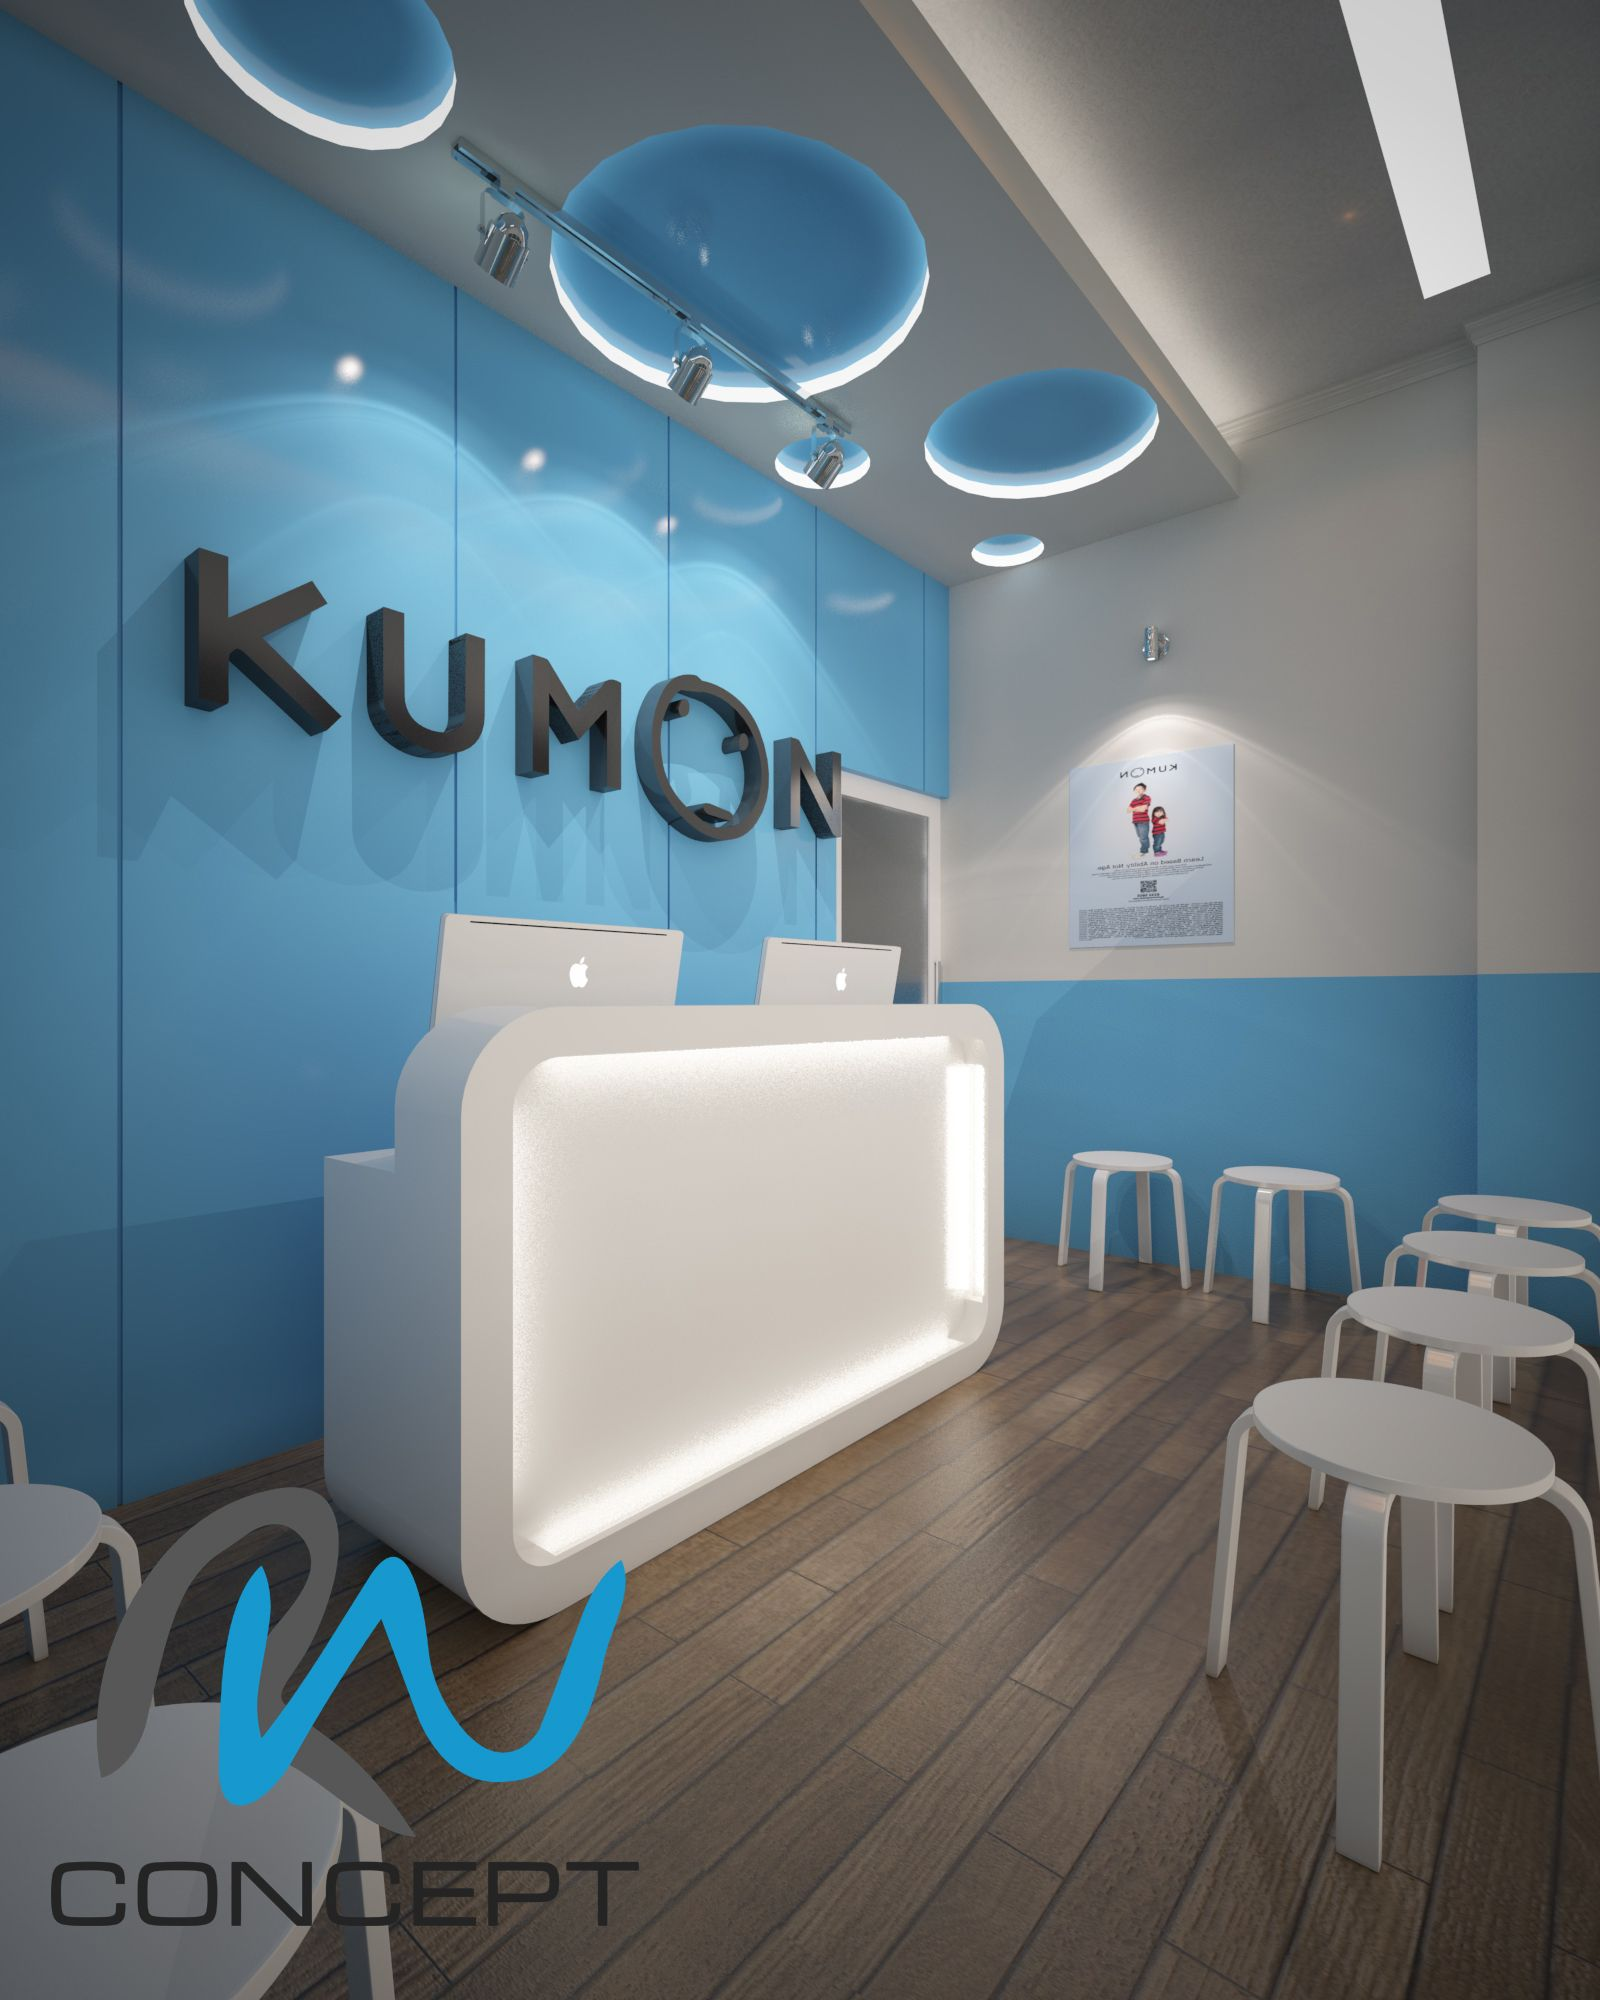 Kumon Design. Tangerang Selatan, Indonesia. Design U0026 3D By Radyan Winata RW  Concept